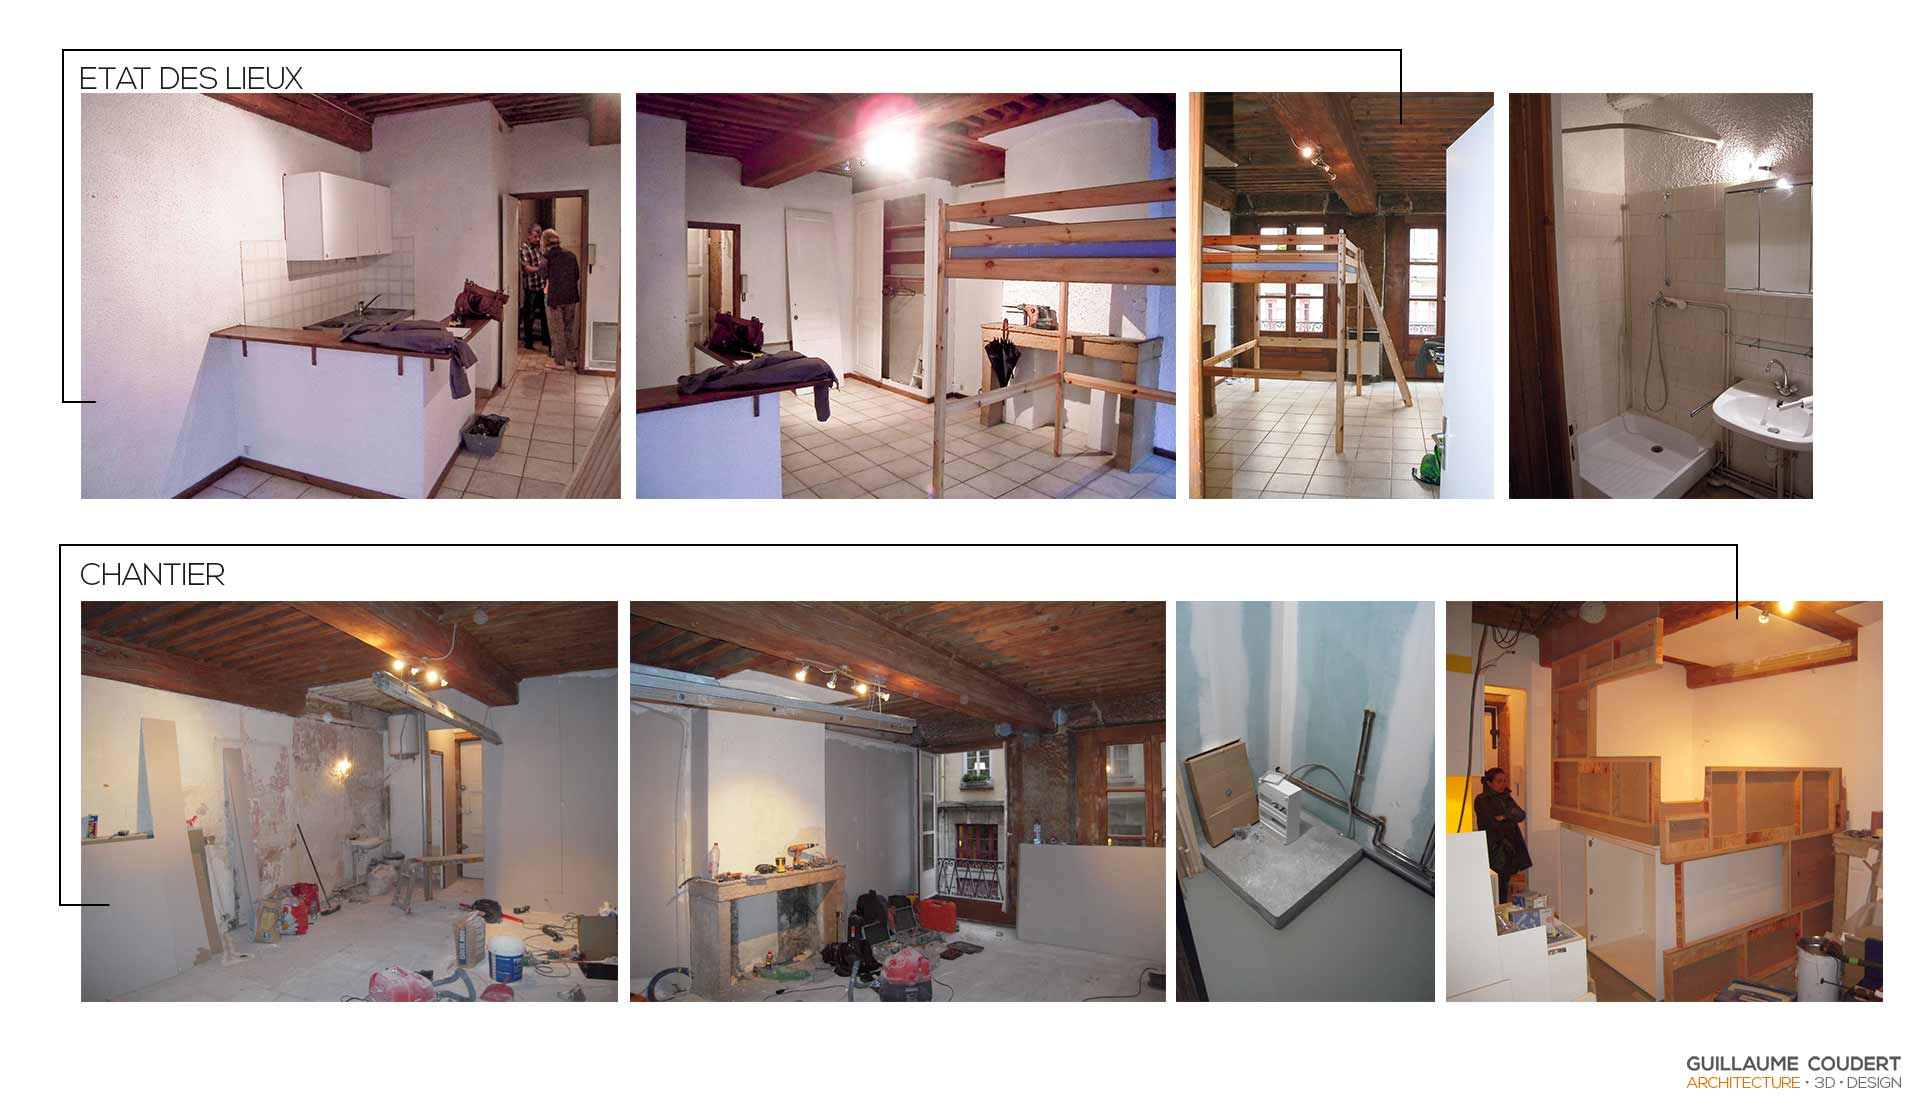 Studio su02 lyon 69001 guillaume coudert architecture for Z architecture lyon